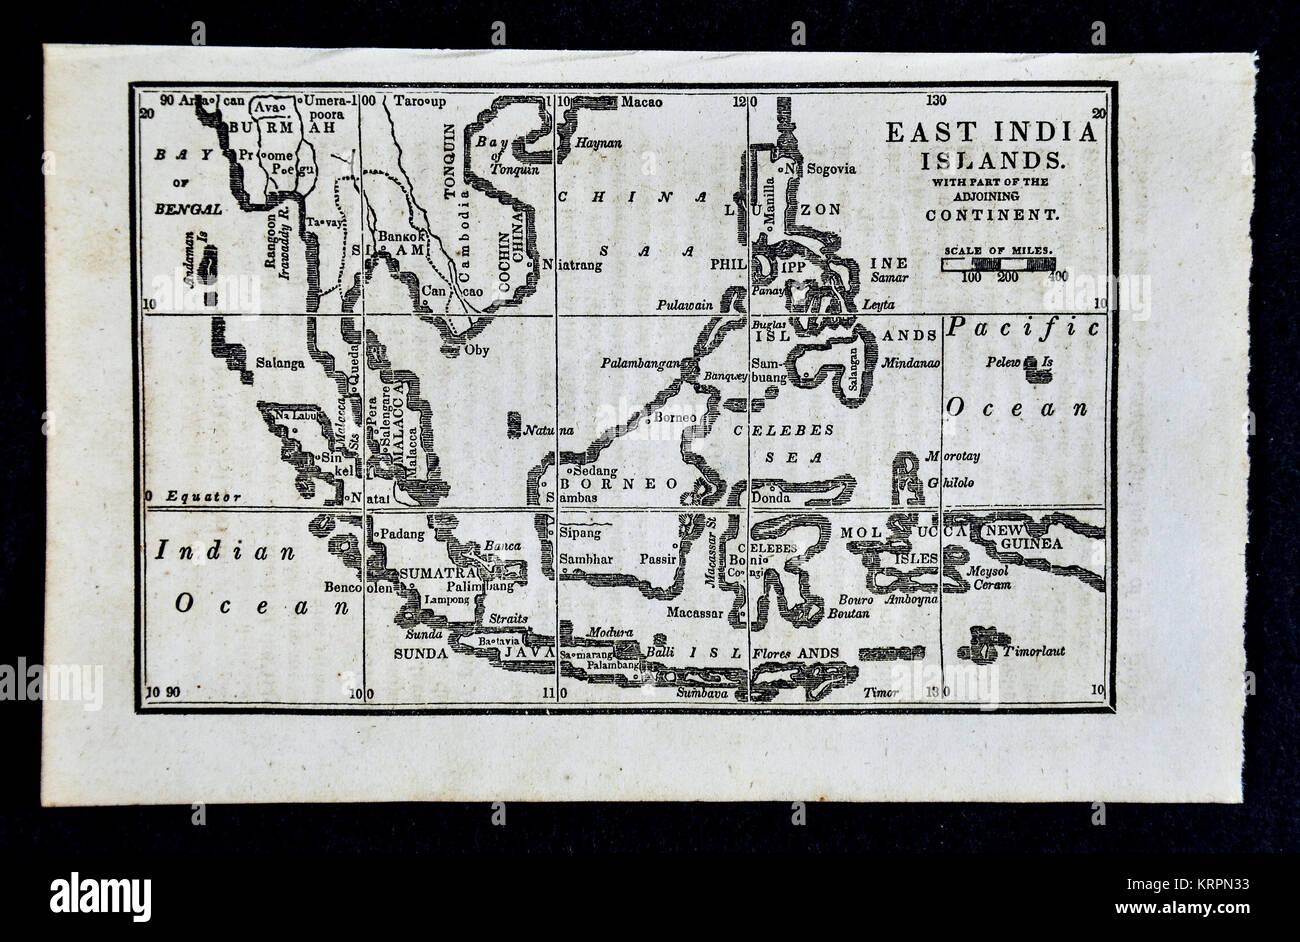 1830 Nathan Hale Map - East Indies - Singapore Malaysia Philippines Sumatra Java Borneo Celebes Stock Photo